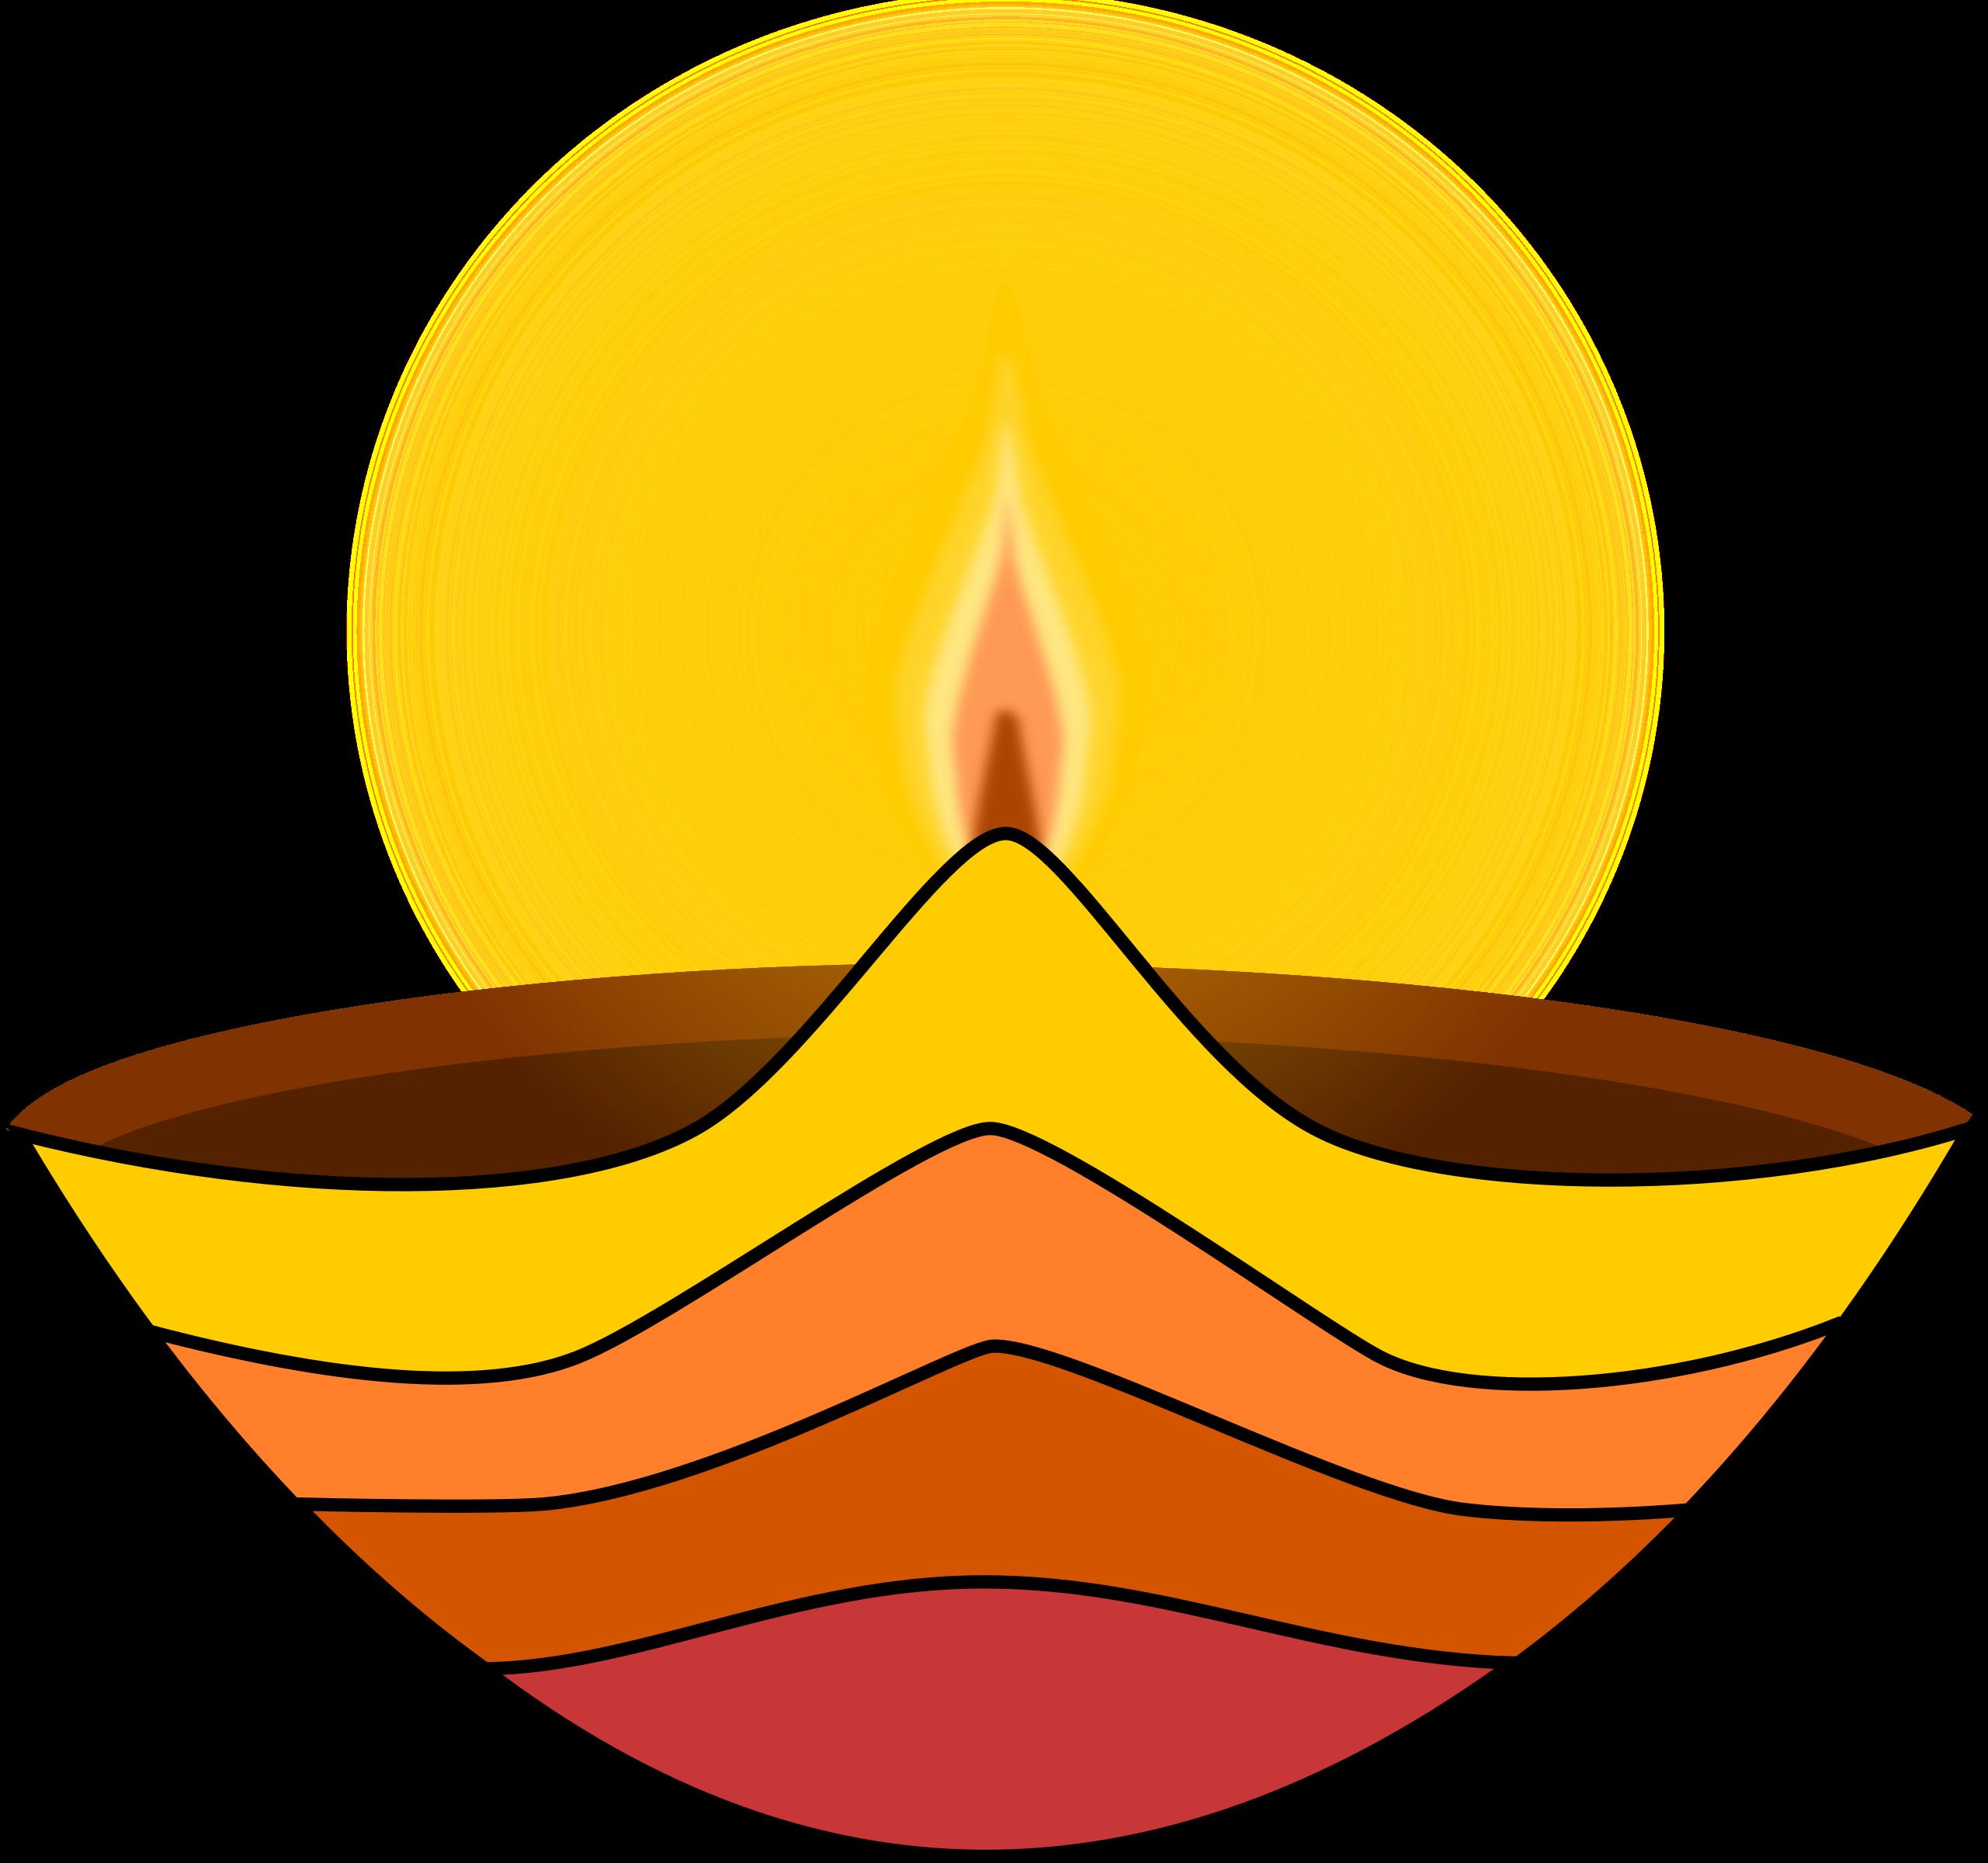 2561x2400 Hindu Deepam Clipart Black And White 3 Clipart Station Happy Diwali Images Diwali Images Happy Diwali Hd Wallpaper